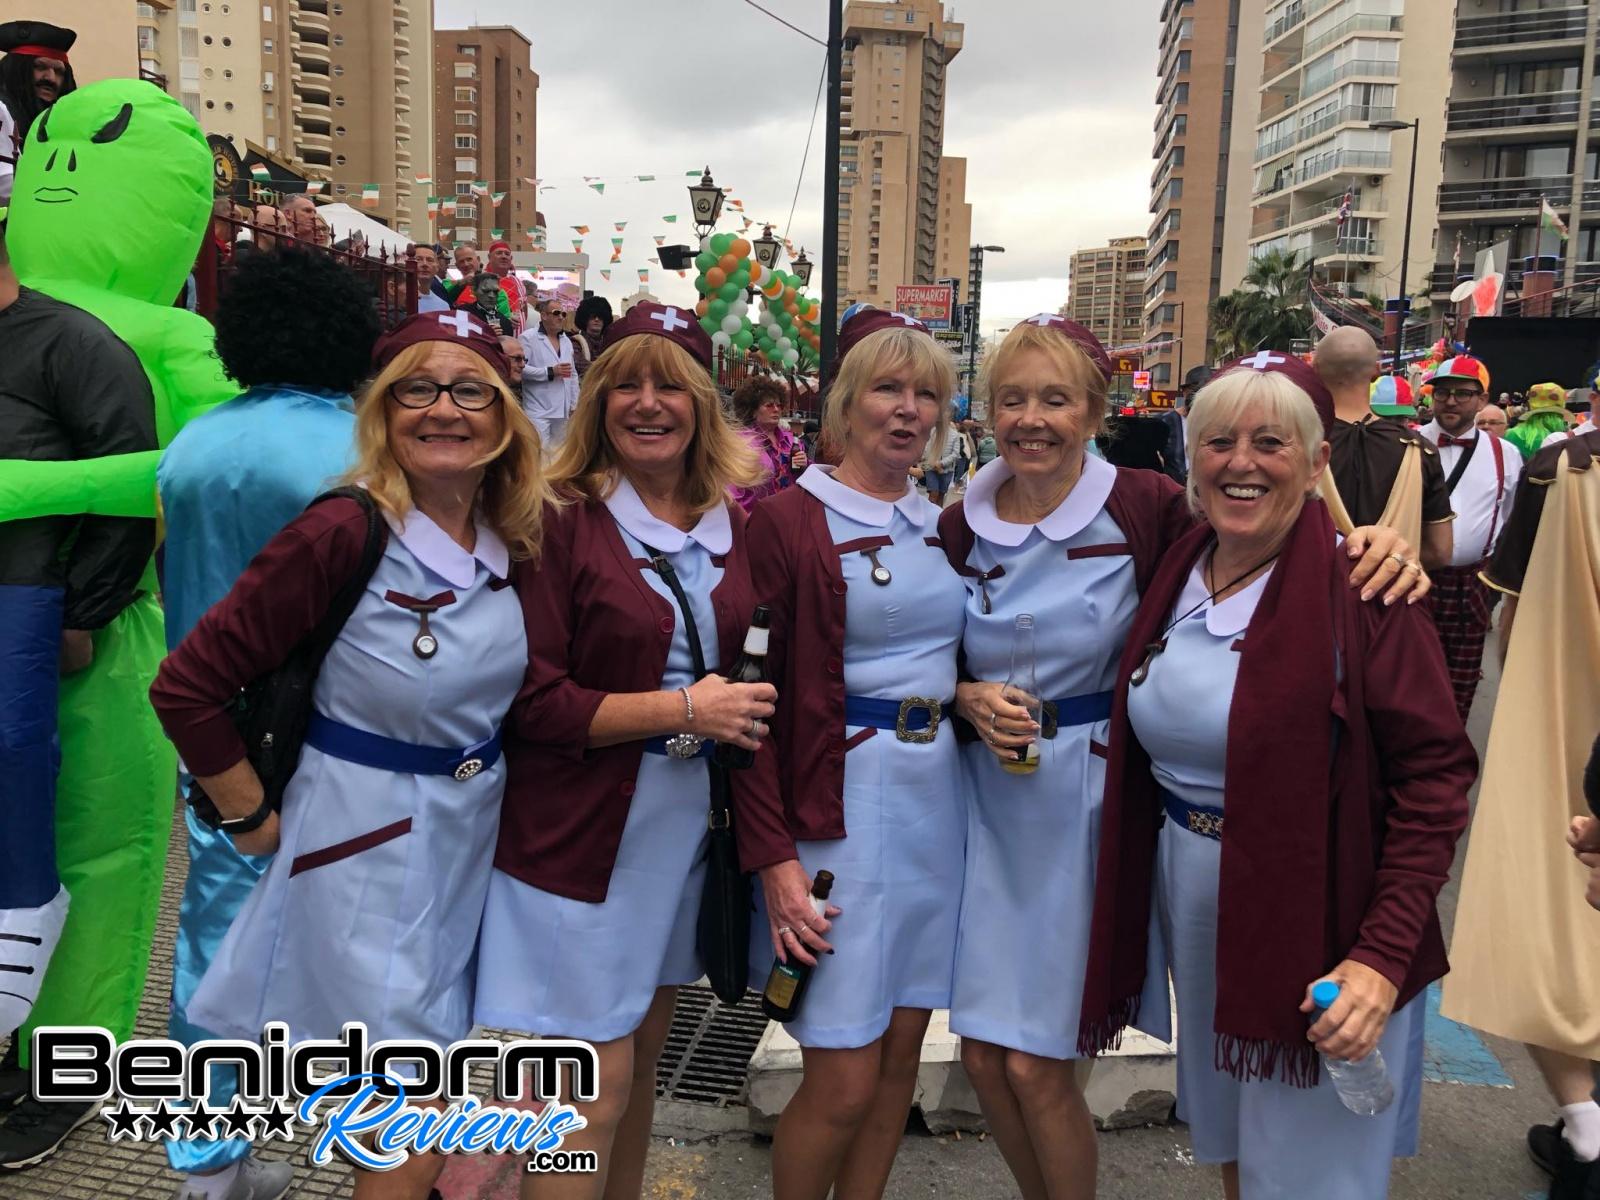 Benidorm-Fiestas-2019-Fancy-Dress-22